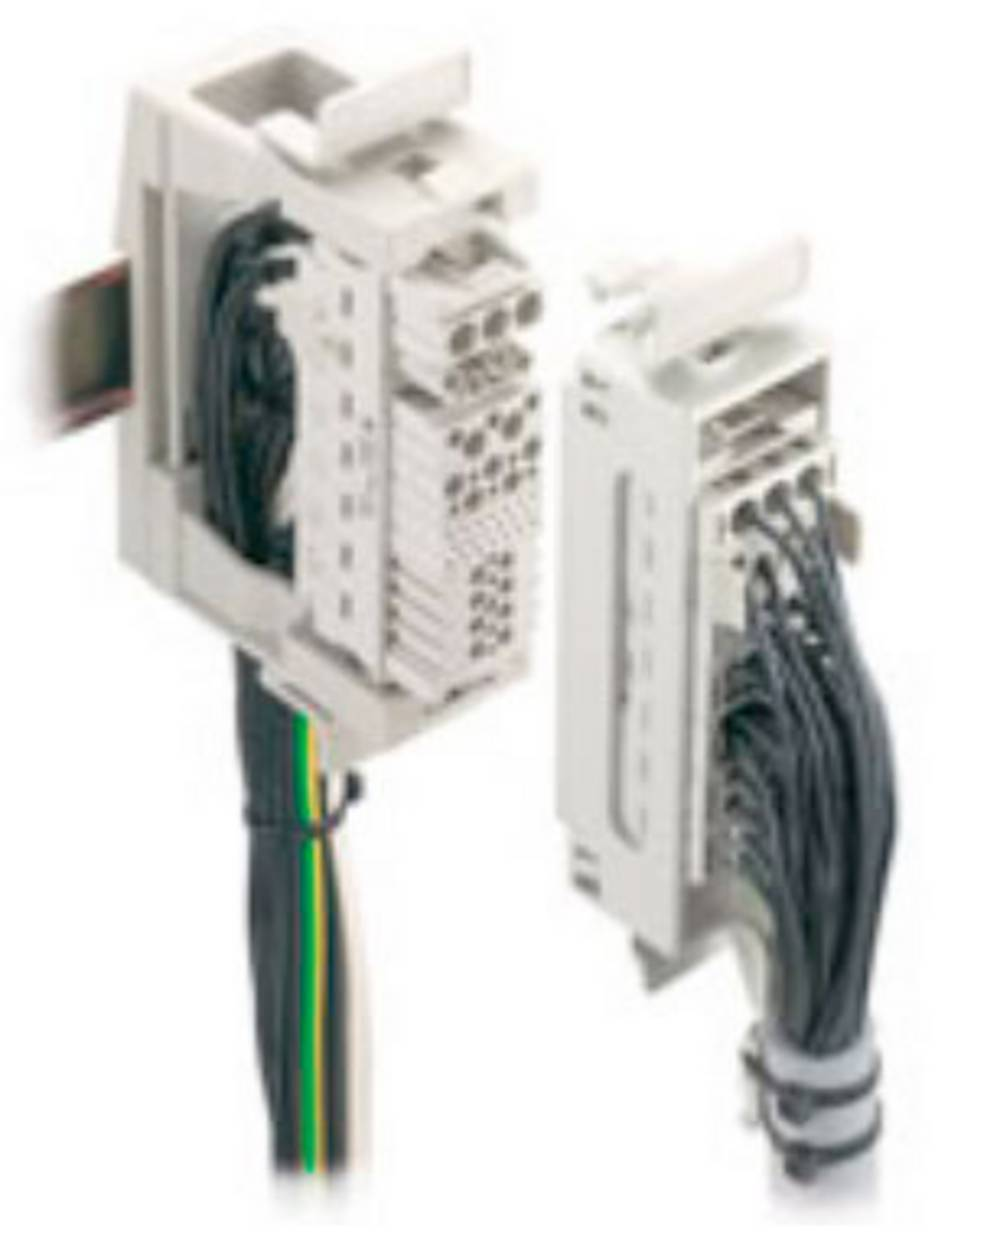 Industristikforbindelse Amphenol C146 Weidmüller HDC RAILMATE HB6 SET 1 stk